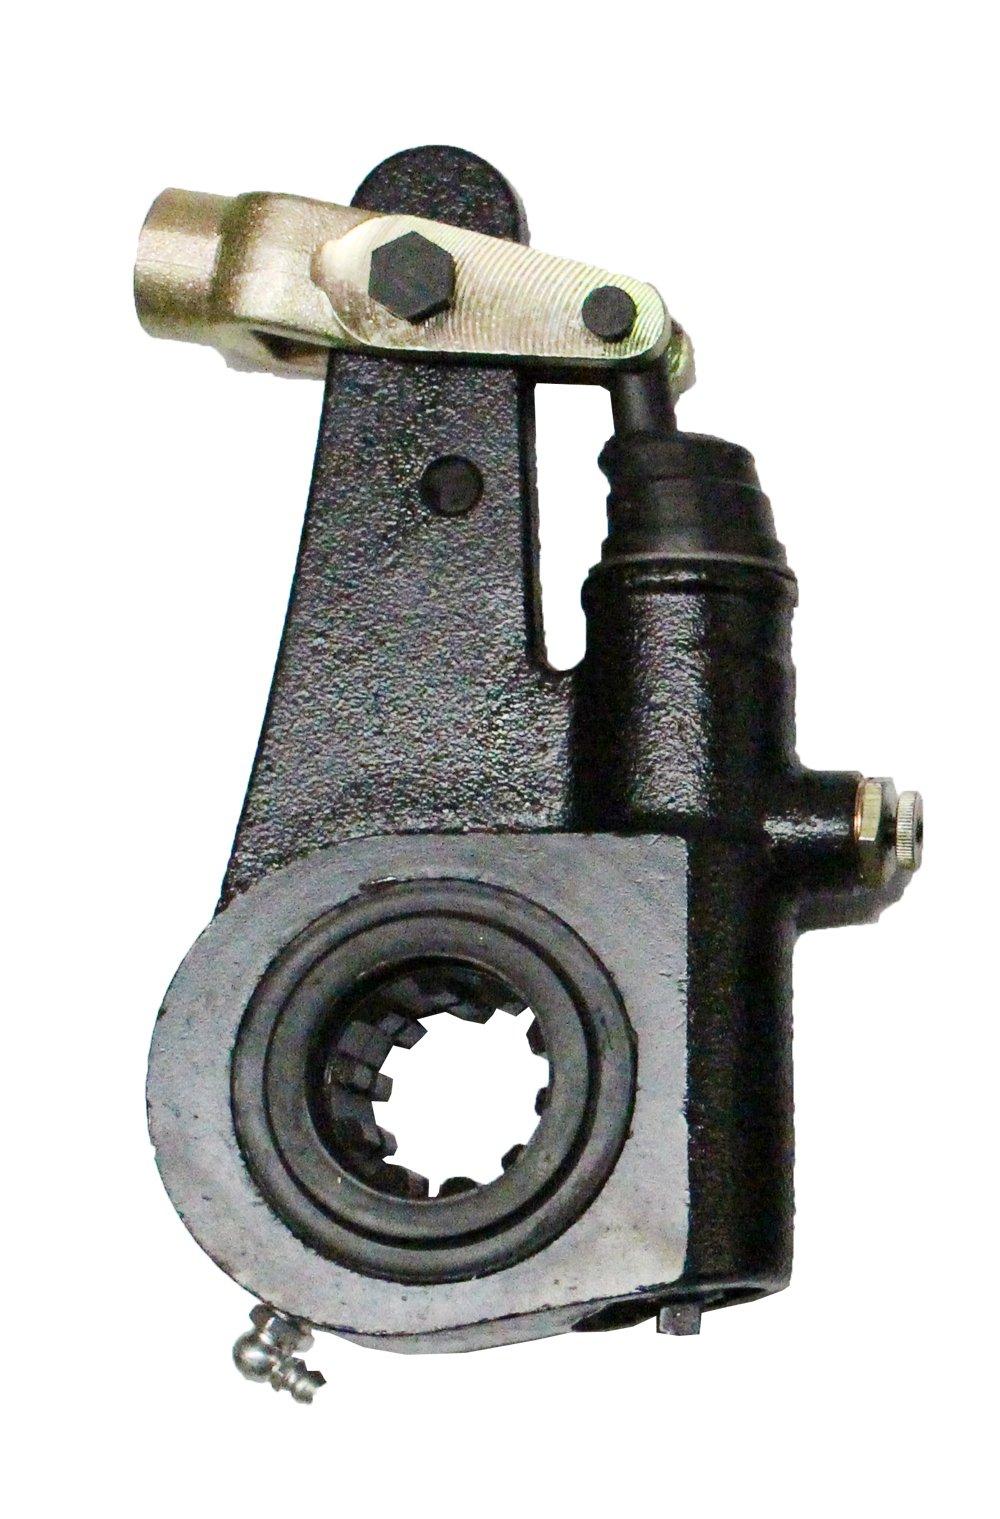 PetaParts PAW 25-011 Automatic Slack Adjuster (1-1/2'' - 10 Spline, 5-1/2'' Length)